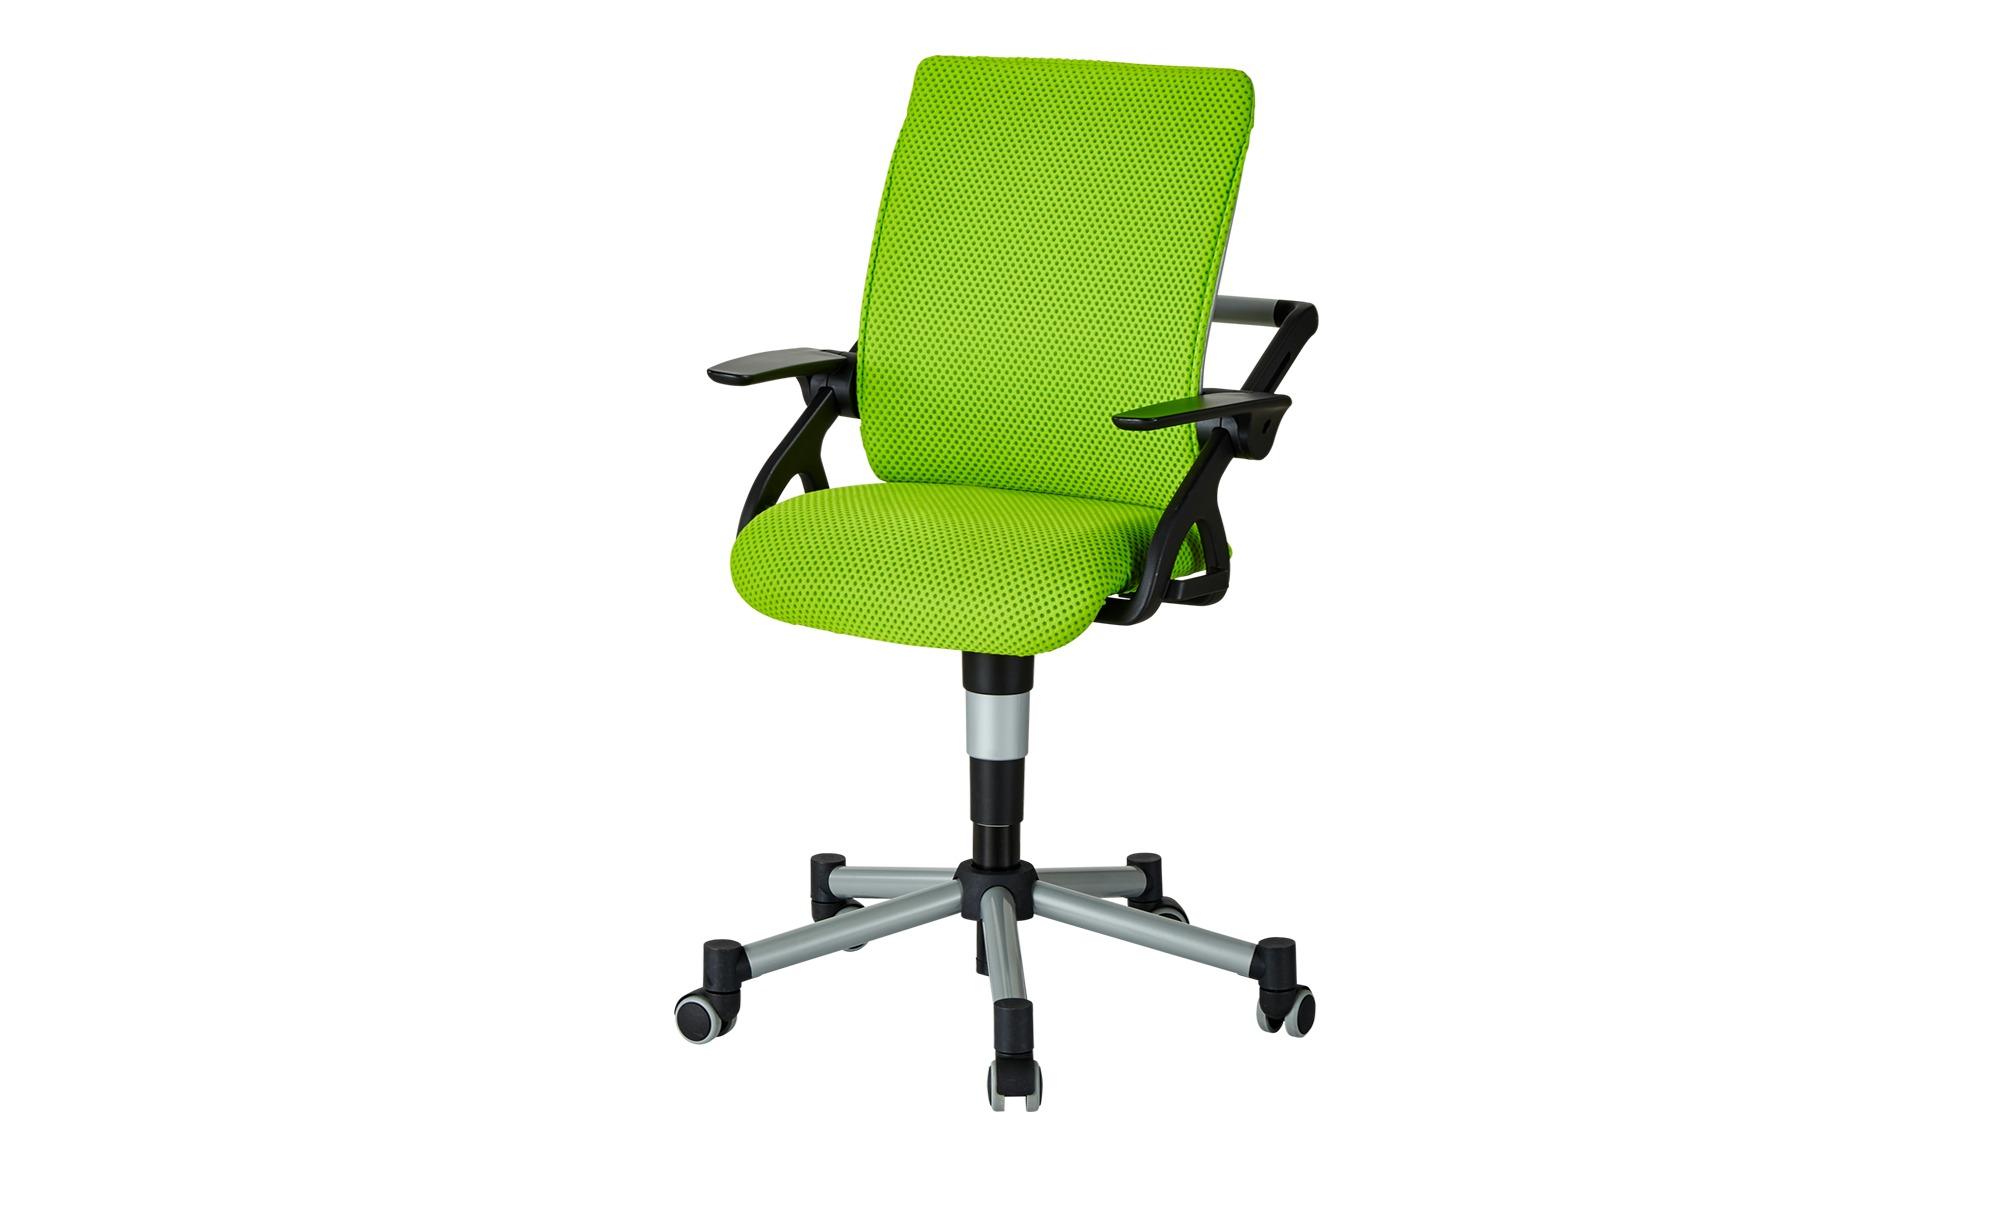 PAIDI Kinder- und Jugenddrehstuhl  Tio - grün - Stühle > Bürostühle > Drehstühle - Möbel Kraft | Kinderzimmer > Kinderzimmerstühle | Grün | PAIDI